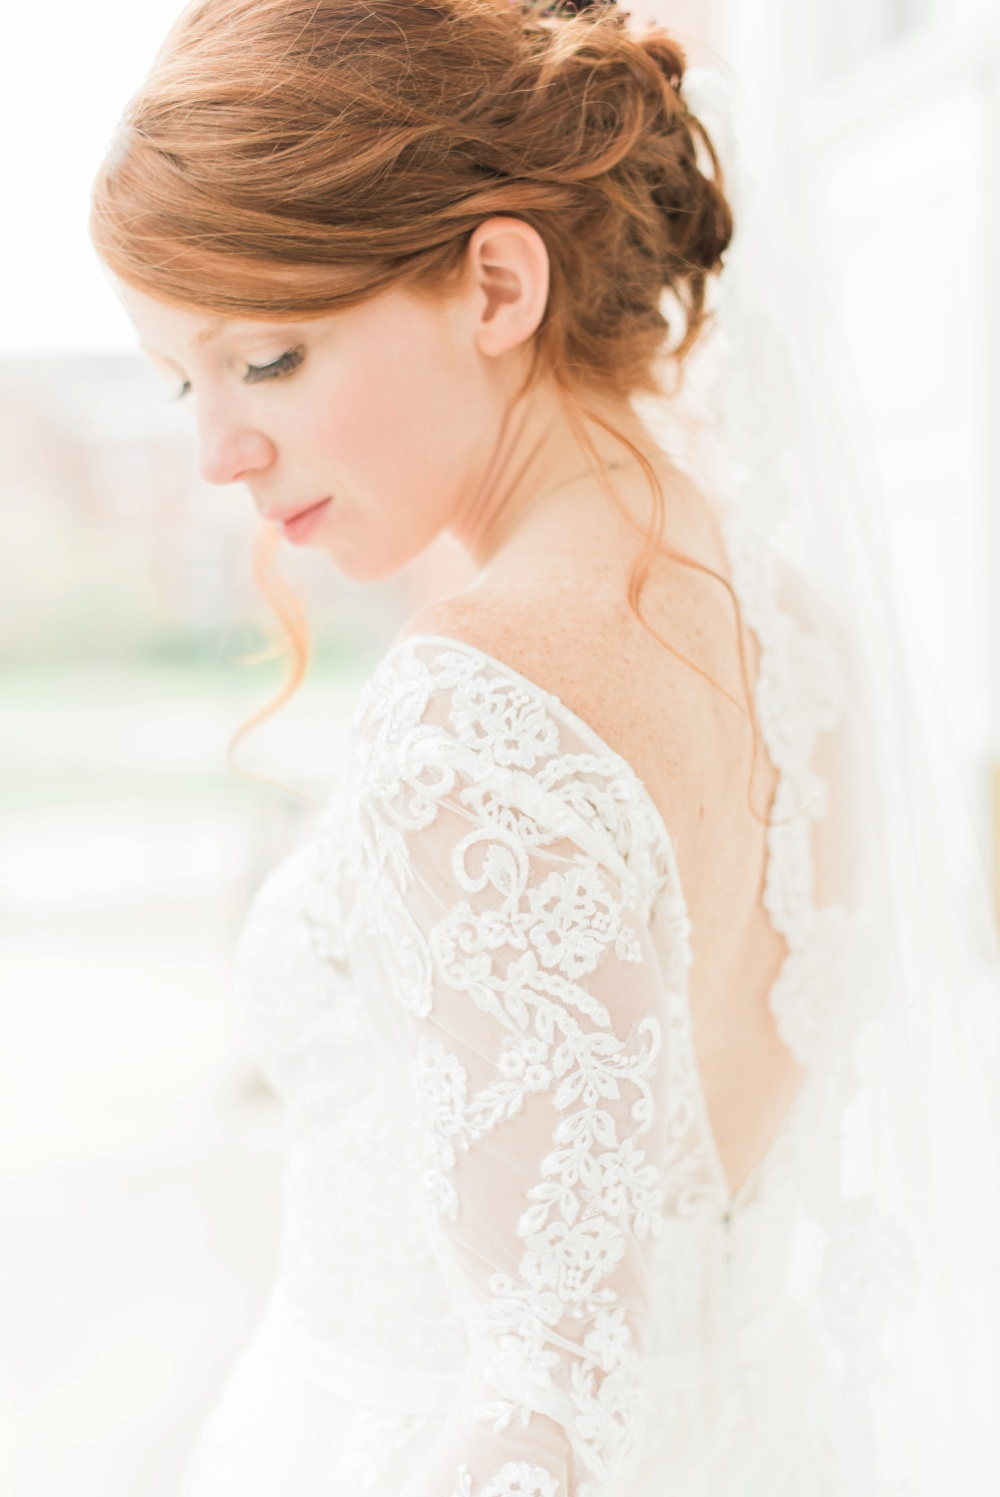 ohio-university-walter-hall-wedding-athens-anna-mark_0067.jpg